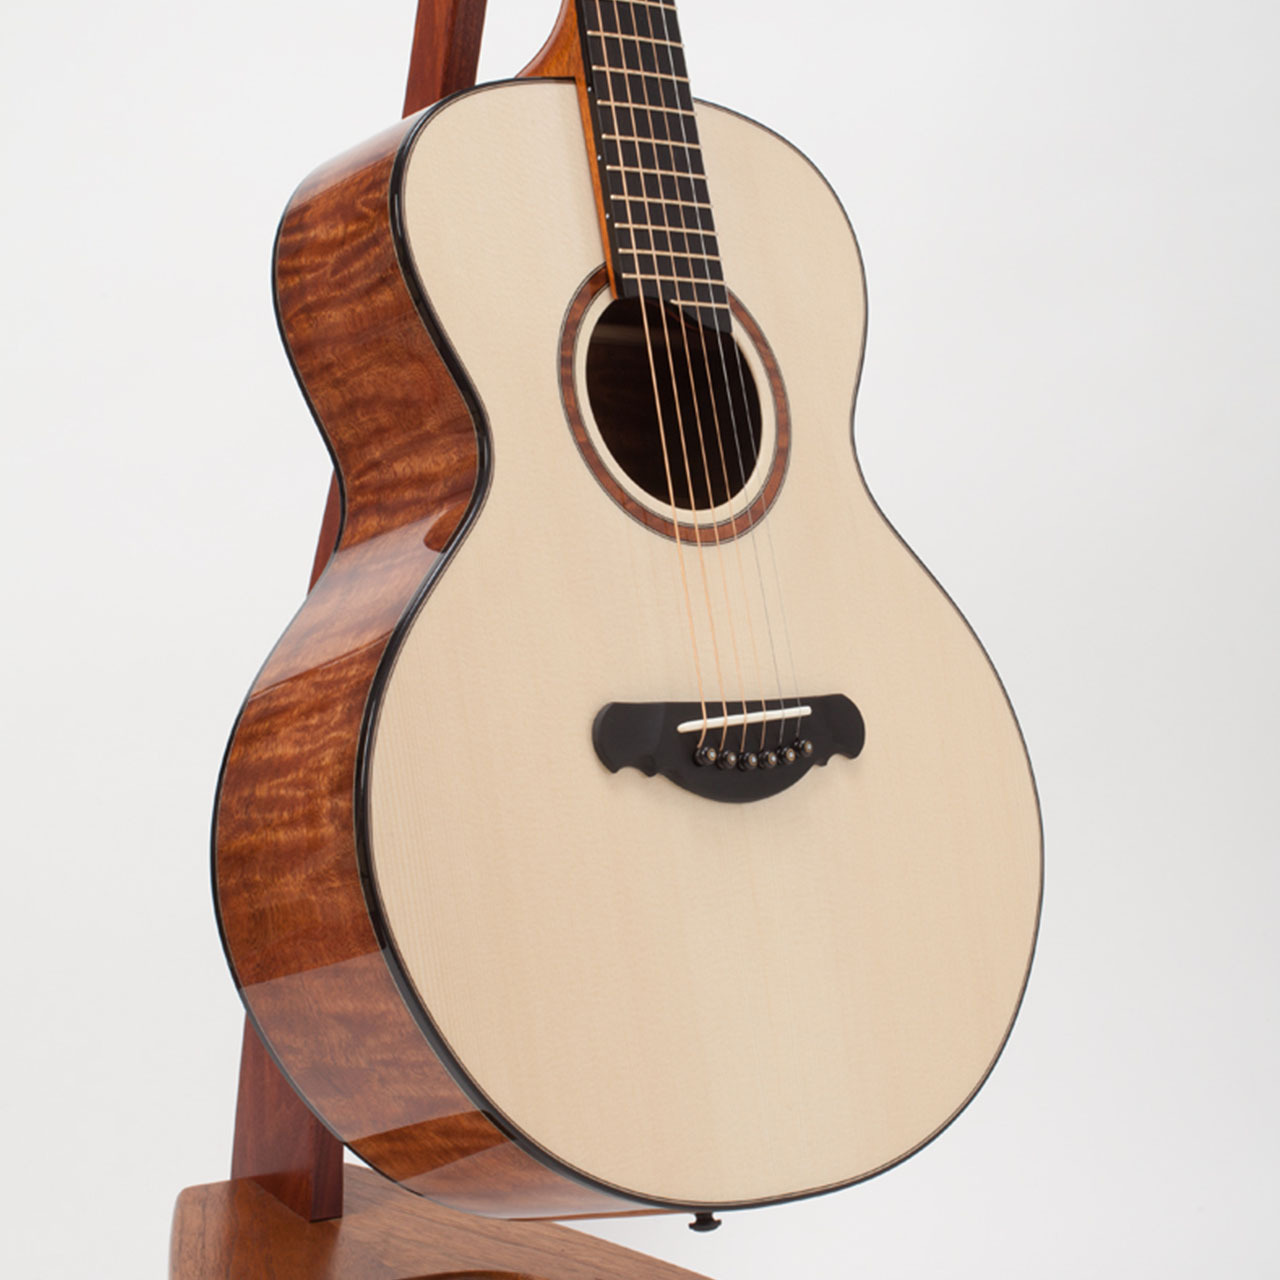 Guitar_6_7__84357.1445947032.1280.1280.jpg